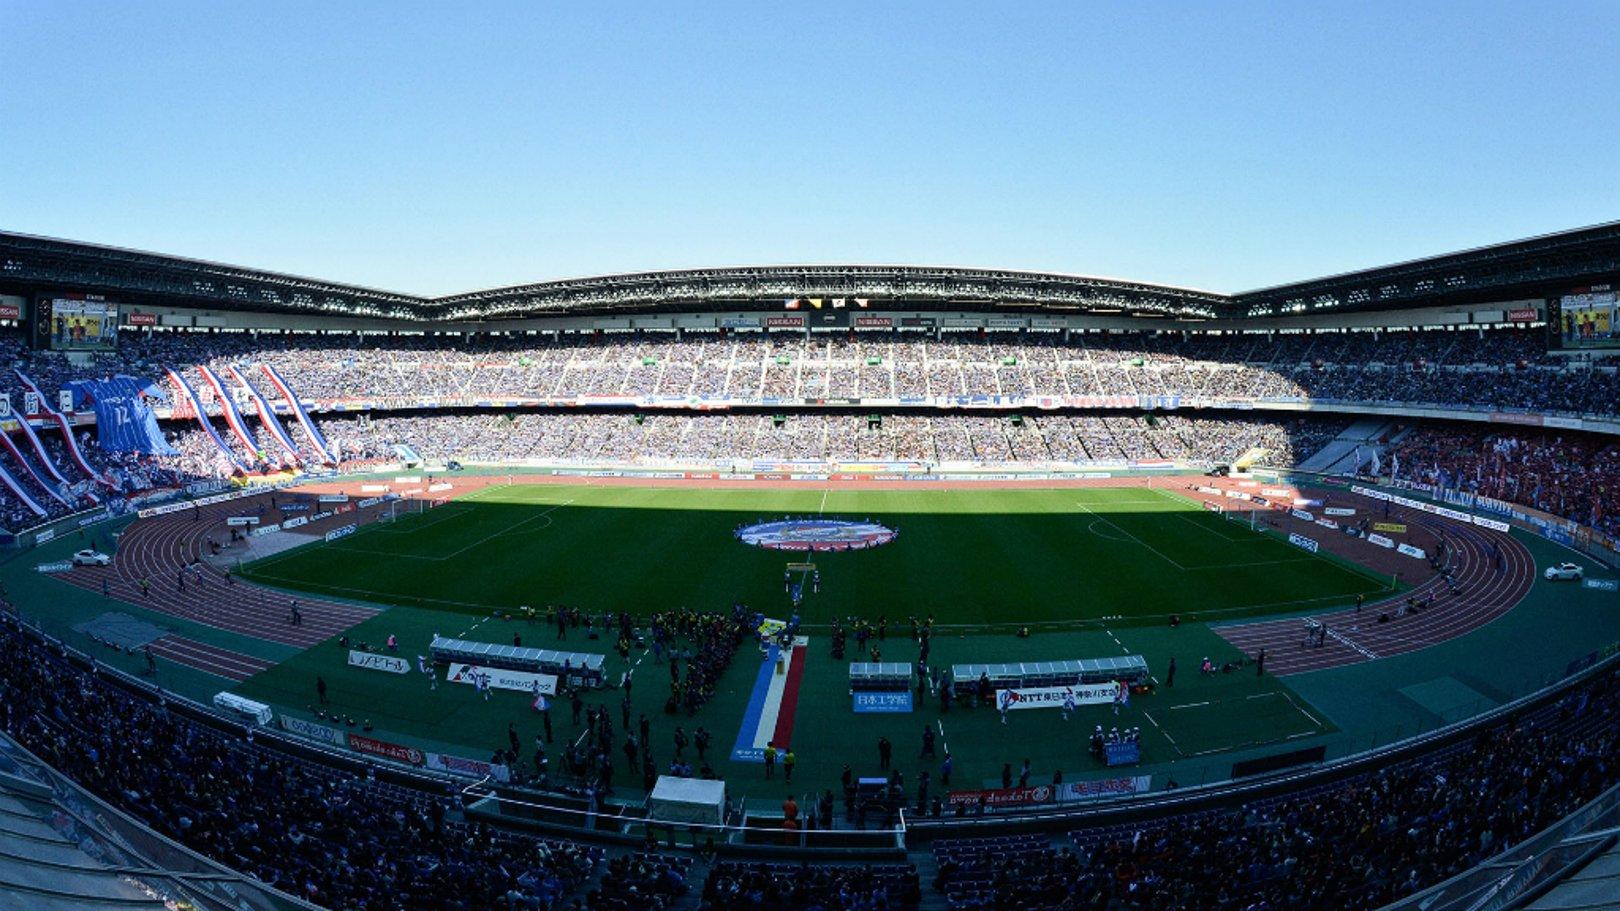 TOUR 2019: City will visit the Nissan Stadium in Yokohama, Japan during this summer's tour of Asia